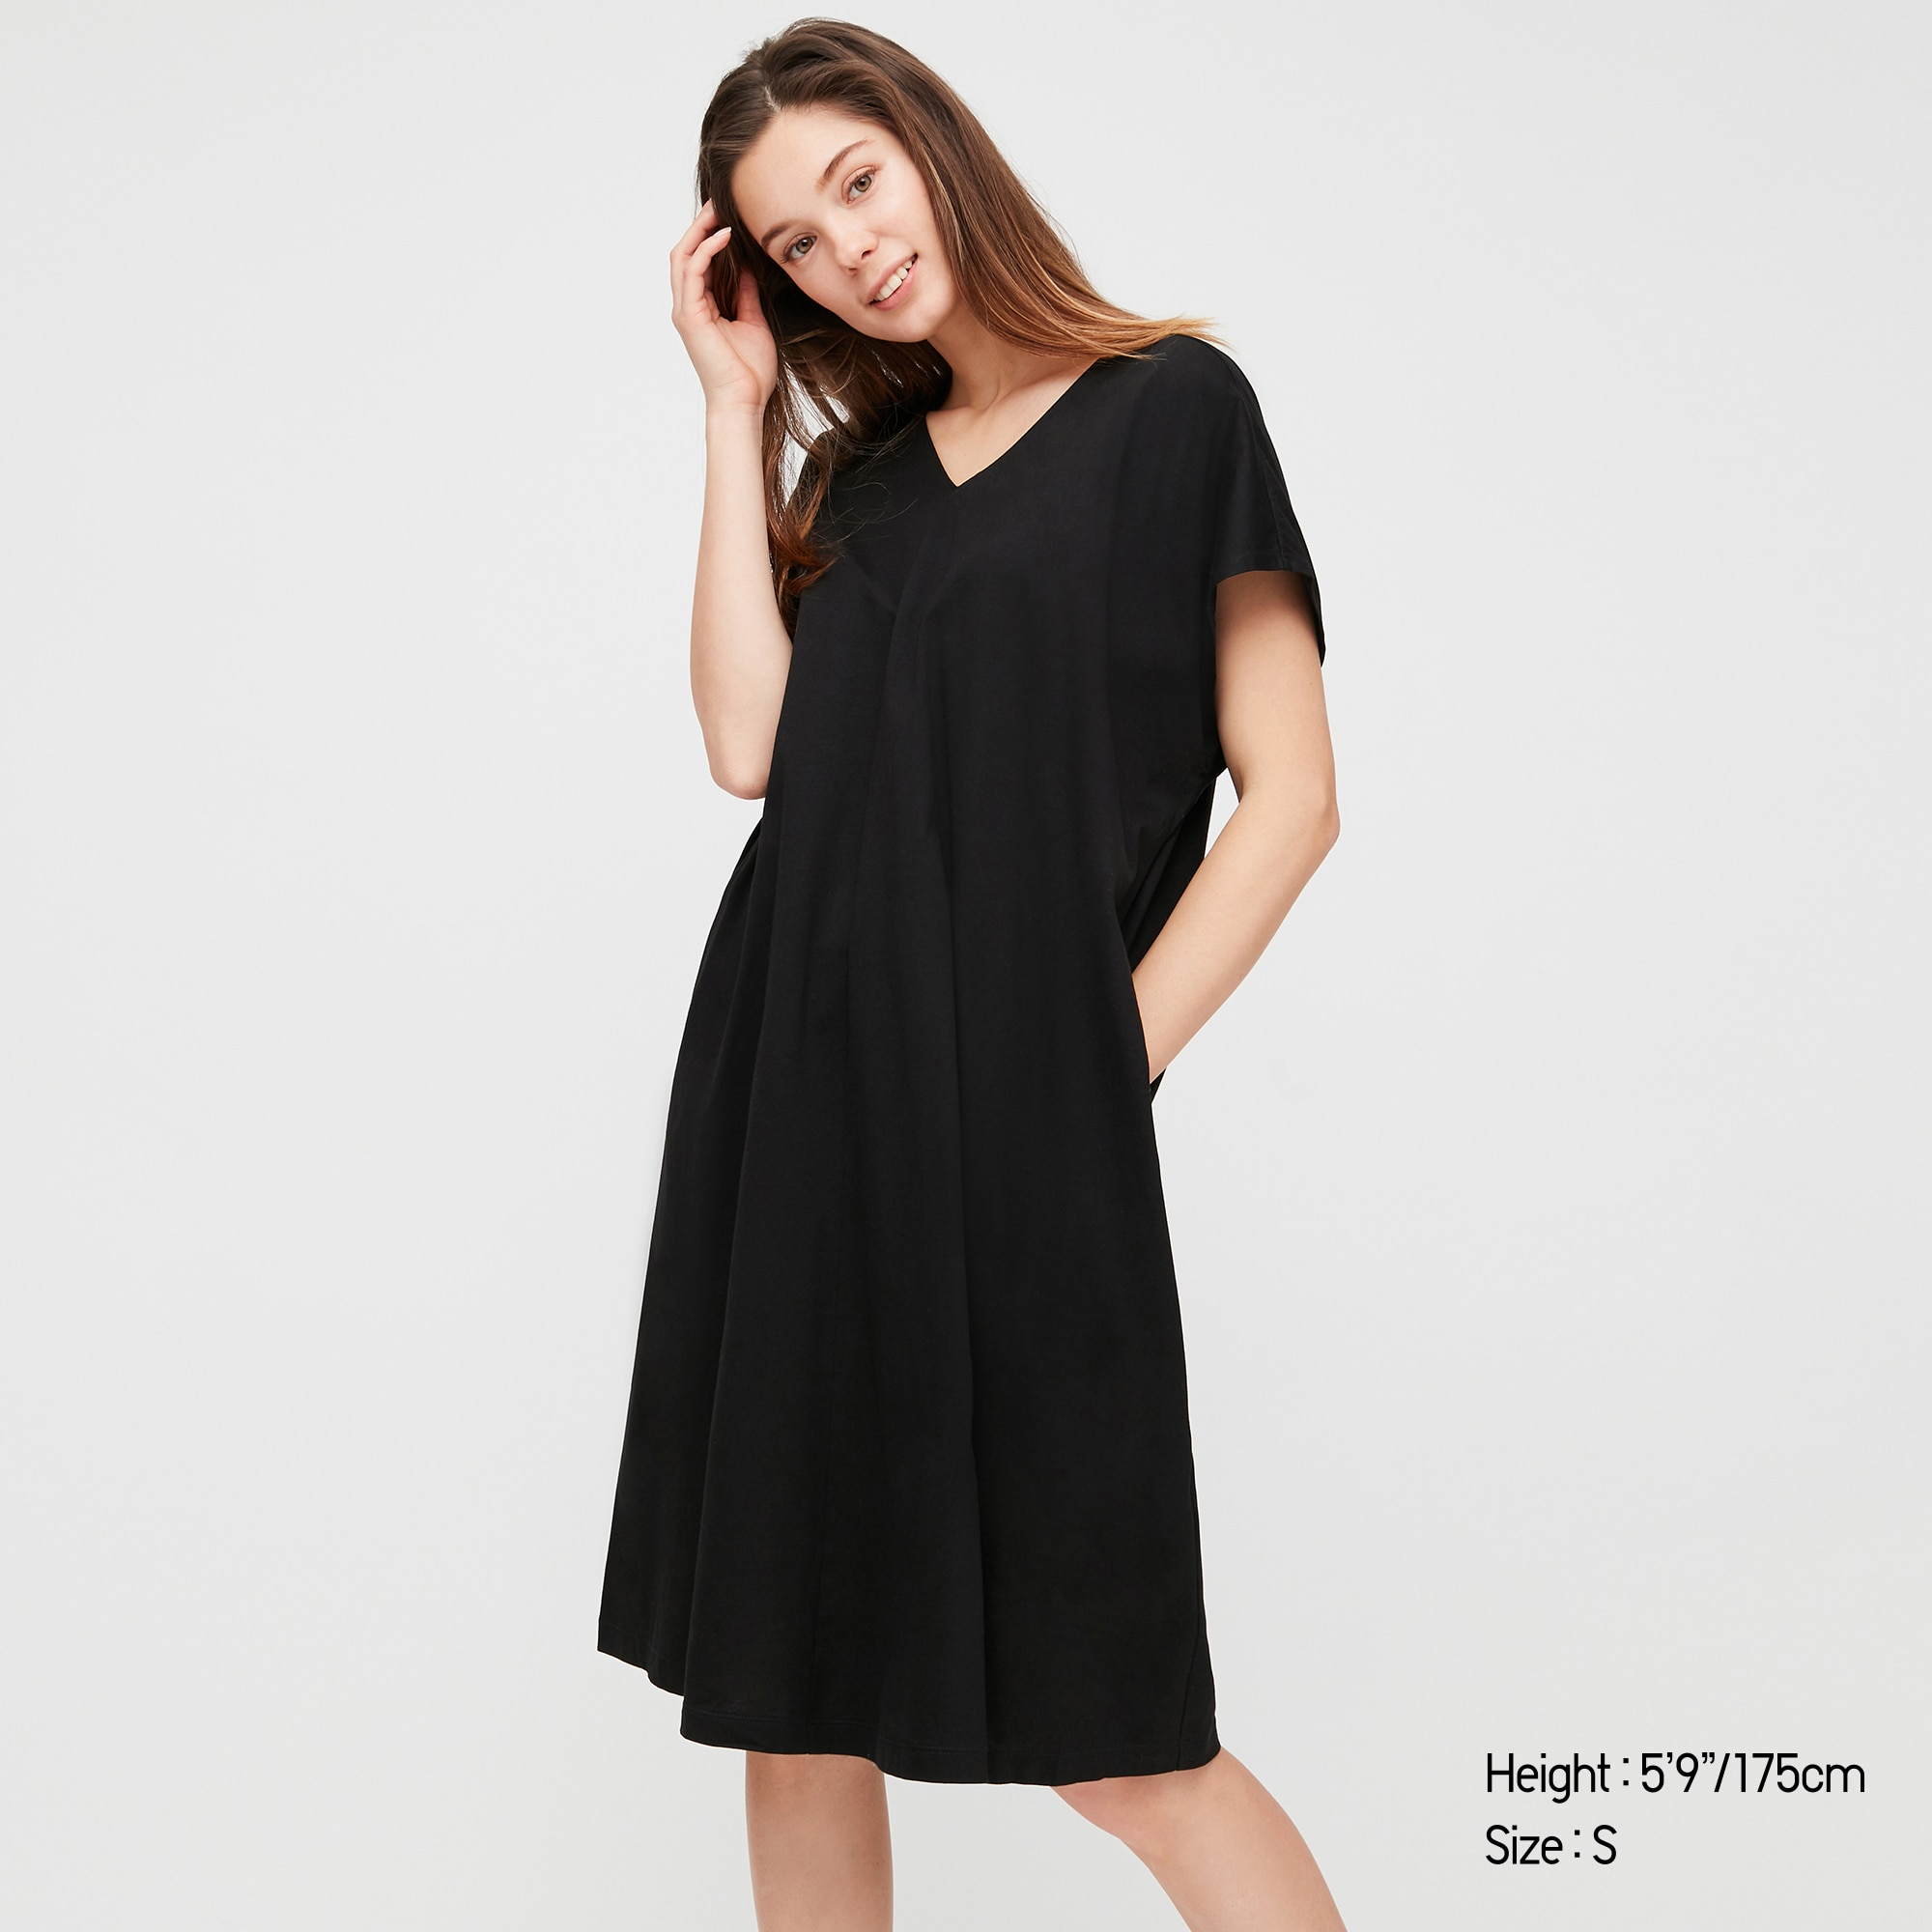 Uniqlo women mercerized cotton short-sleeve cocoon dress